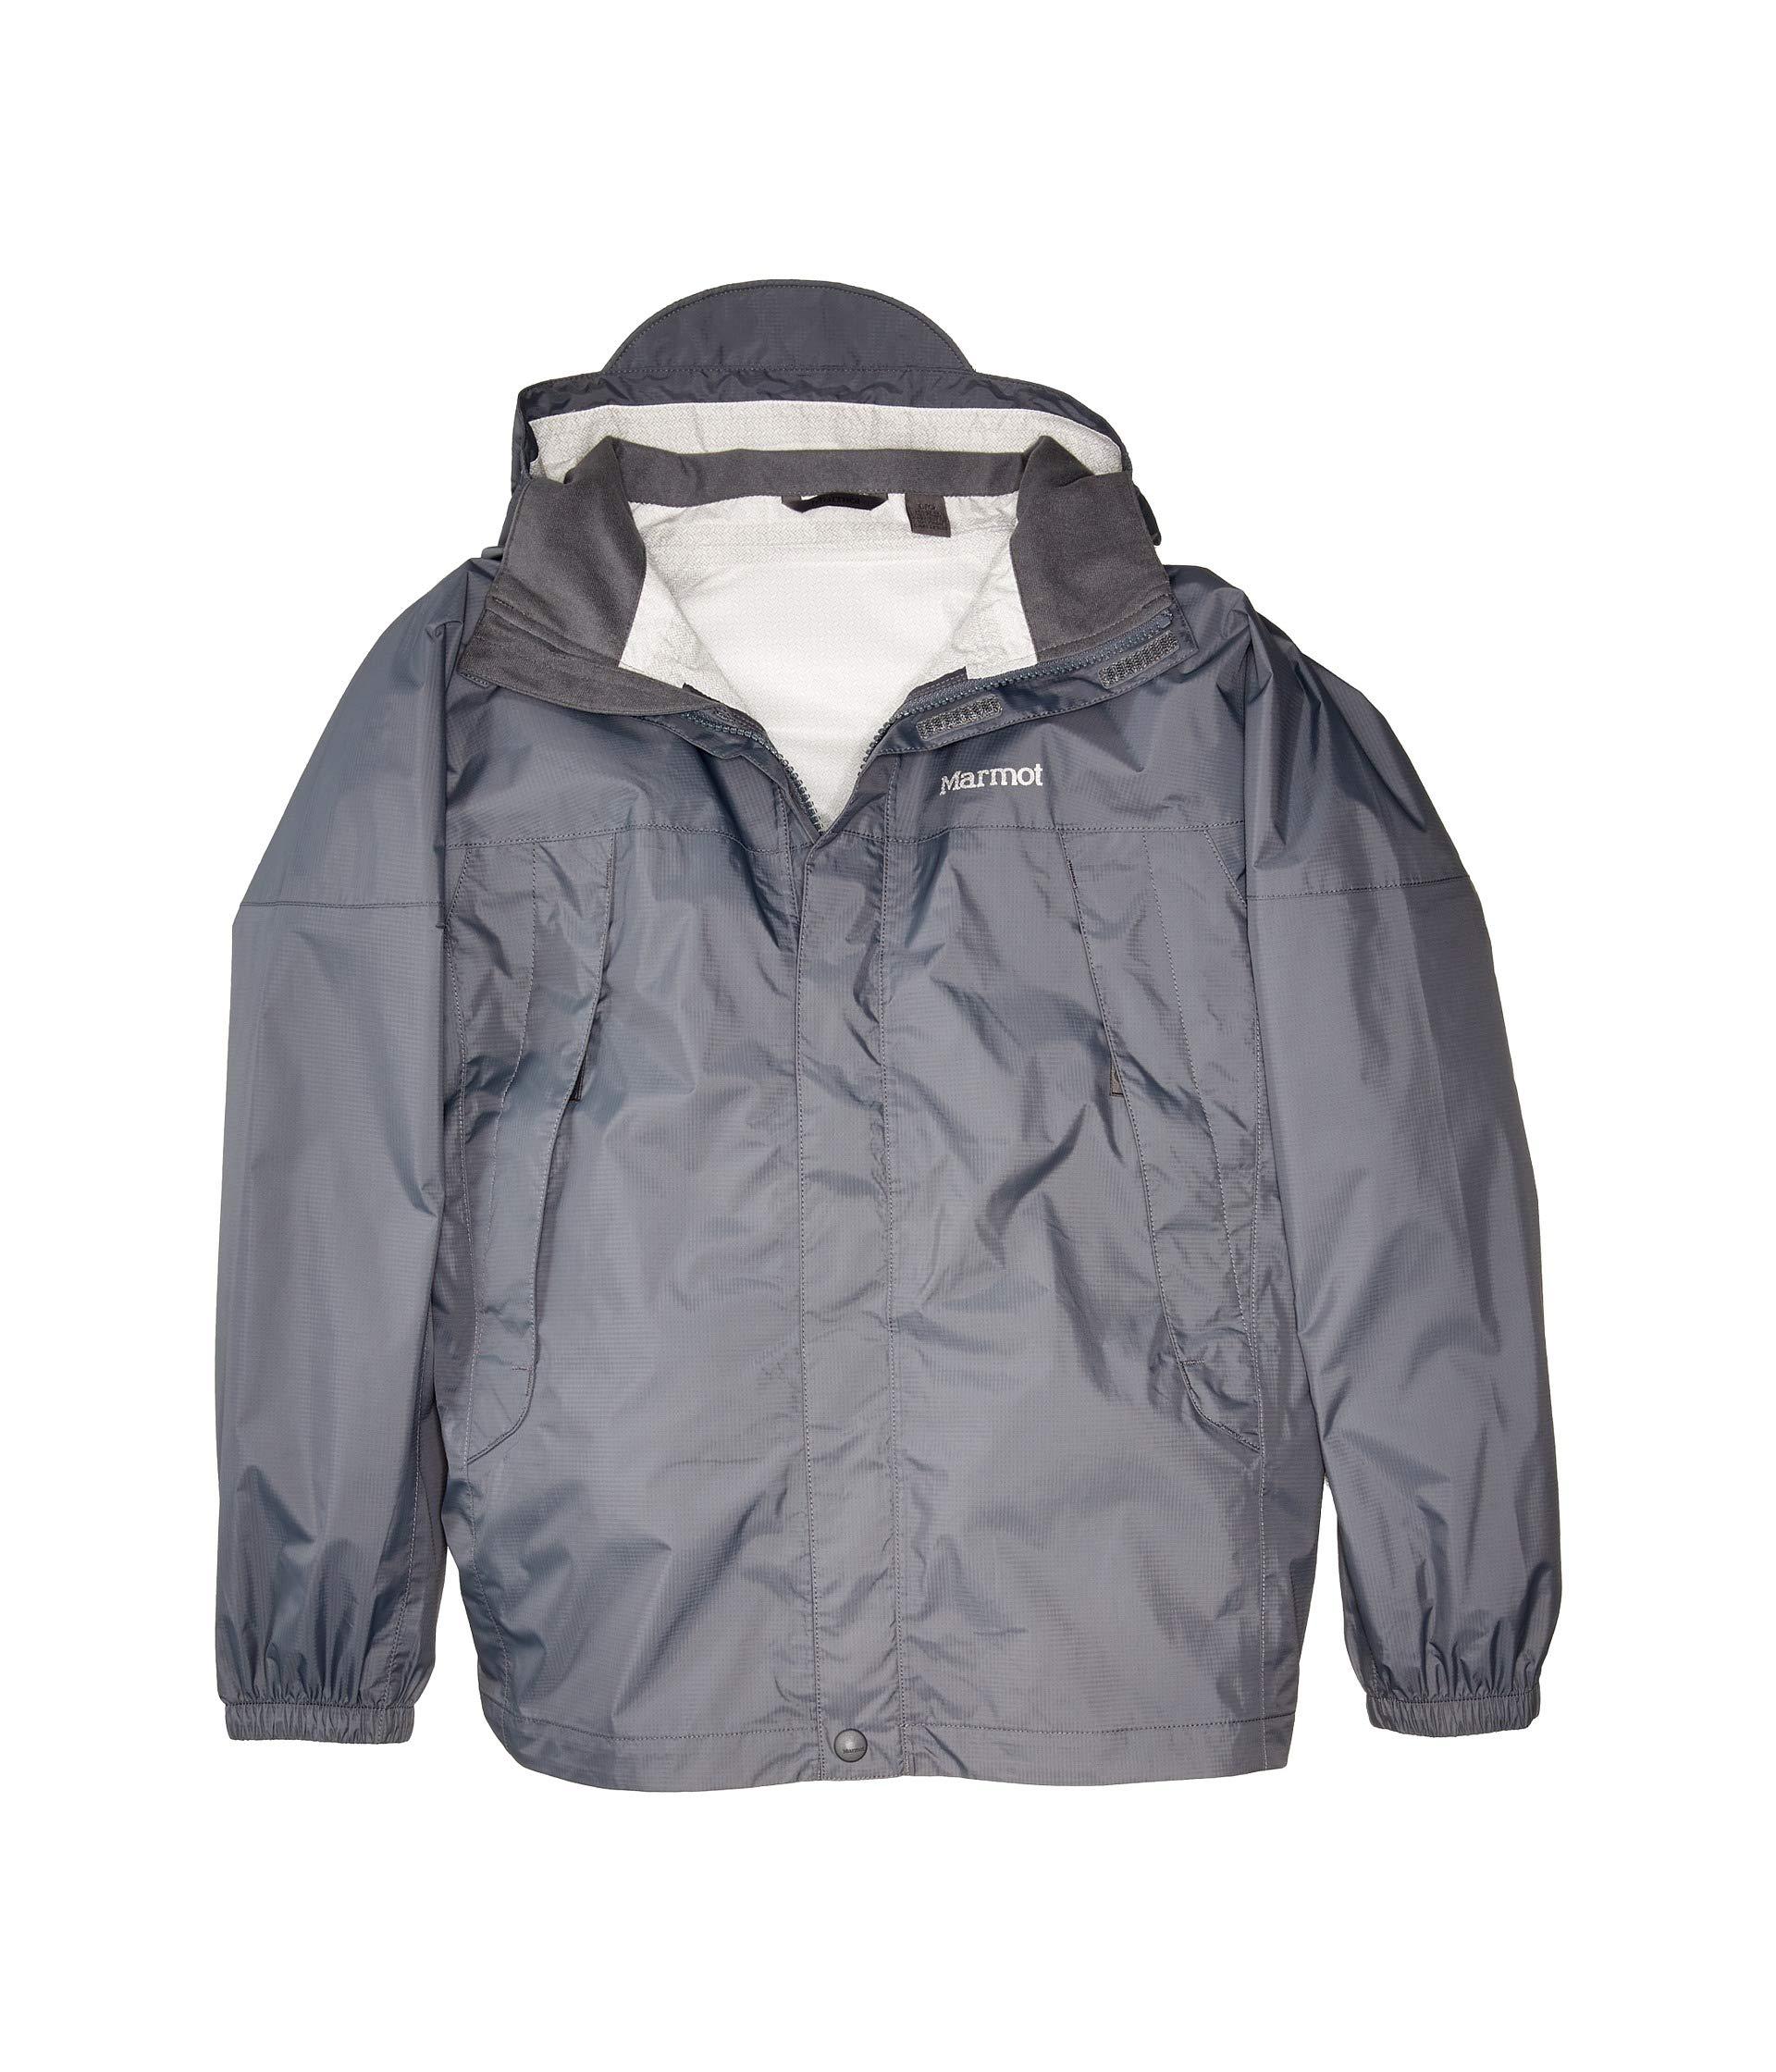 Marmot Kids Boy's PreCip¿ Jacket (Little Kids/Big Kids) Steel Onyx Small